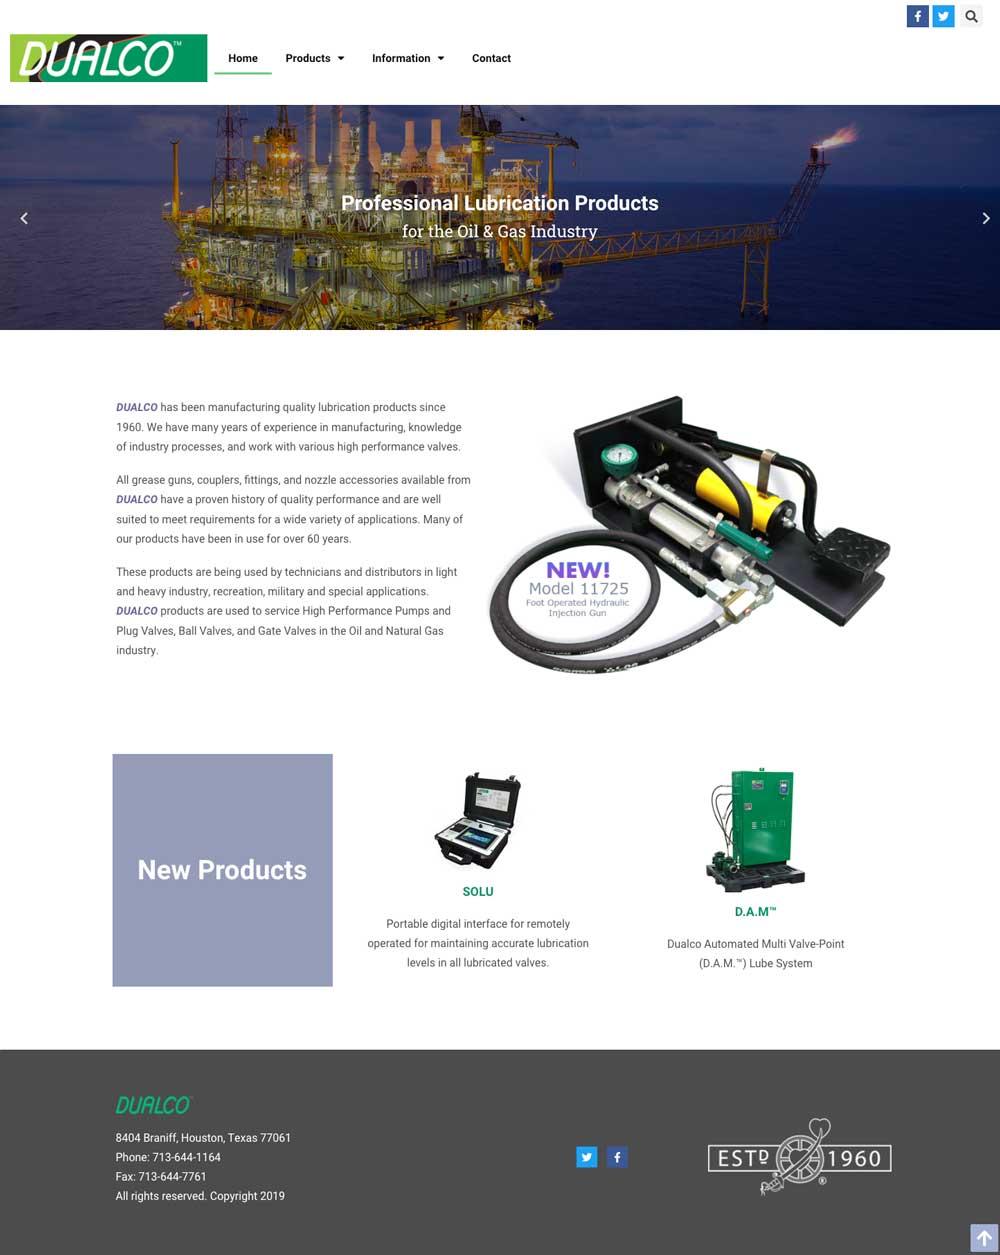 dualco web design tucson arizona